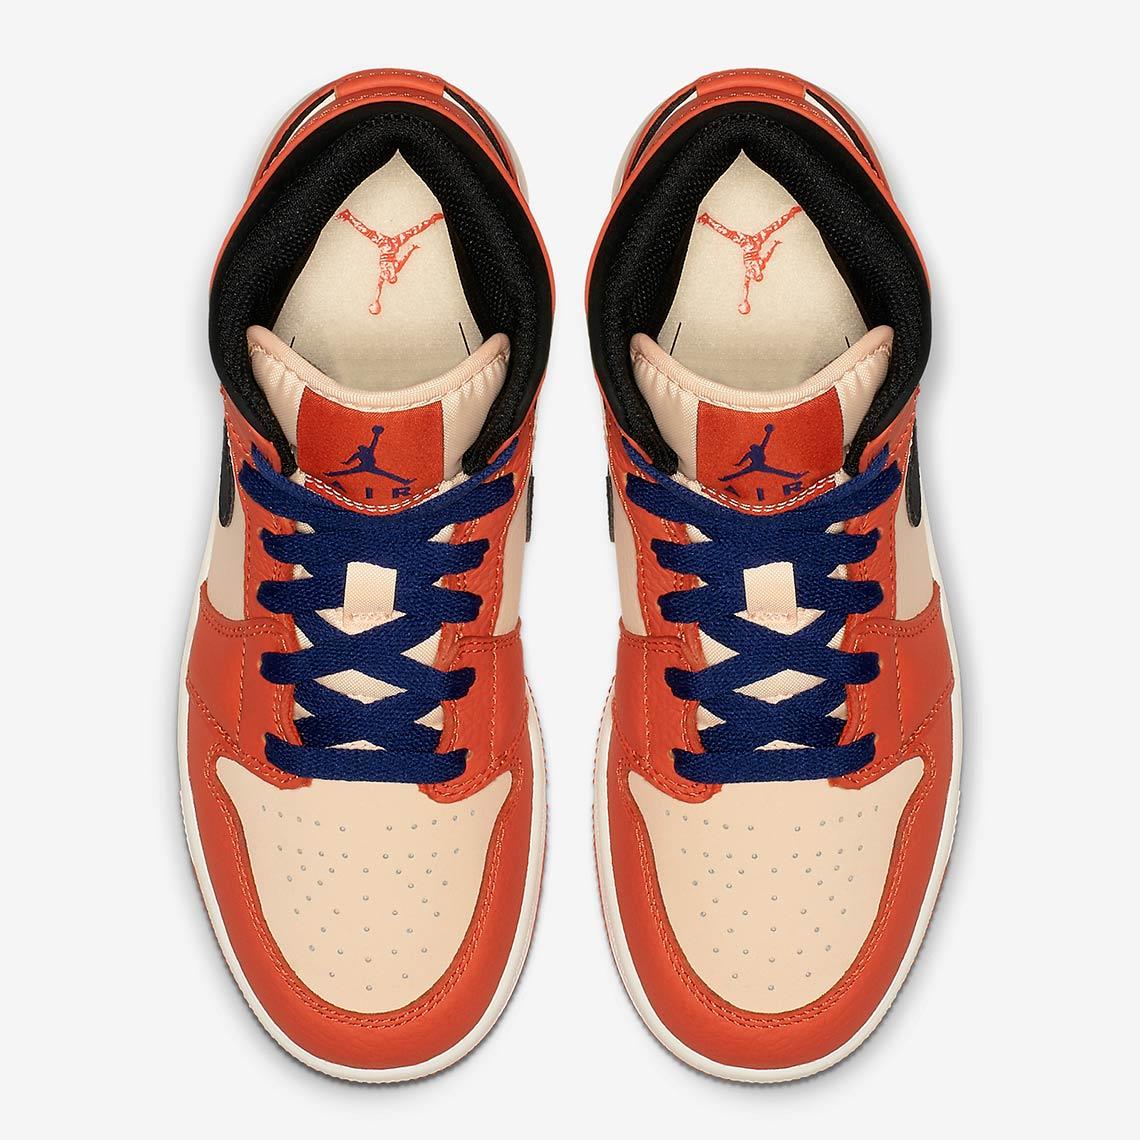 wholesale dealer f2eca 195e7 Jordan 1 Mid Girls Orange BQ6931-800 Release Date   SneakerNews.com